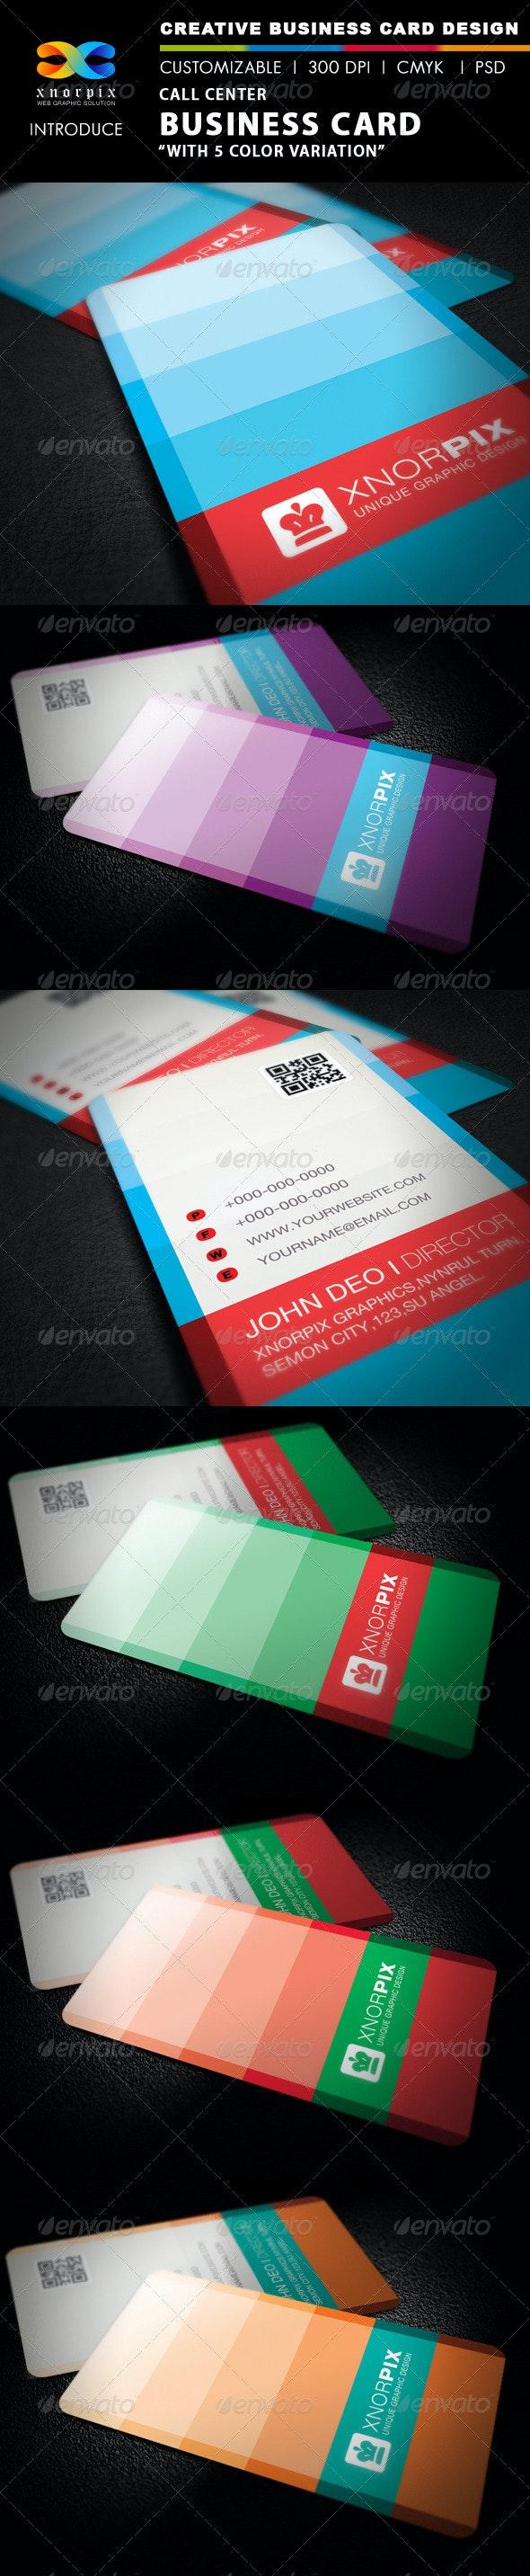 Call Center Business Card - Creative Business Cards